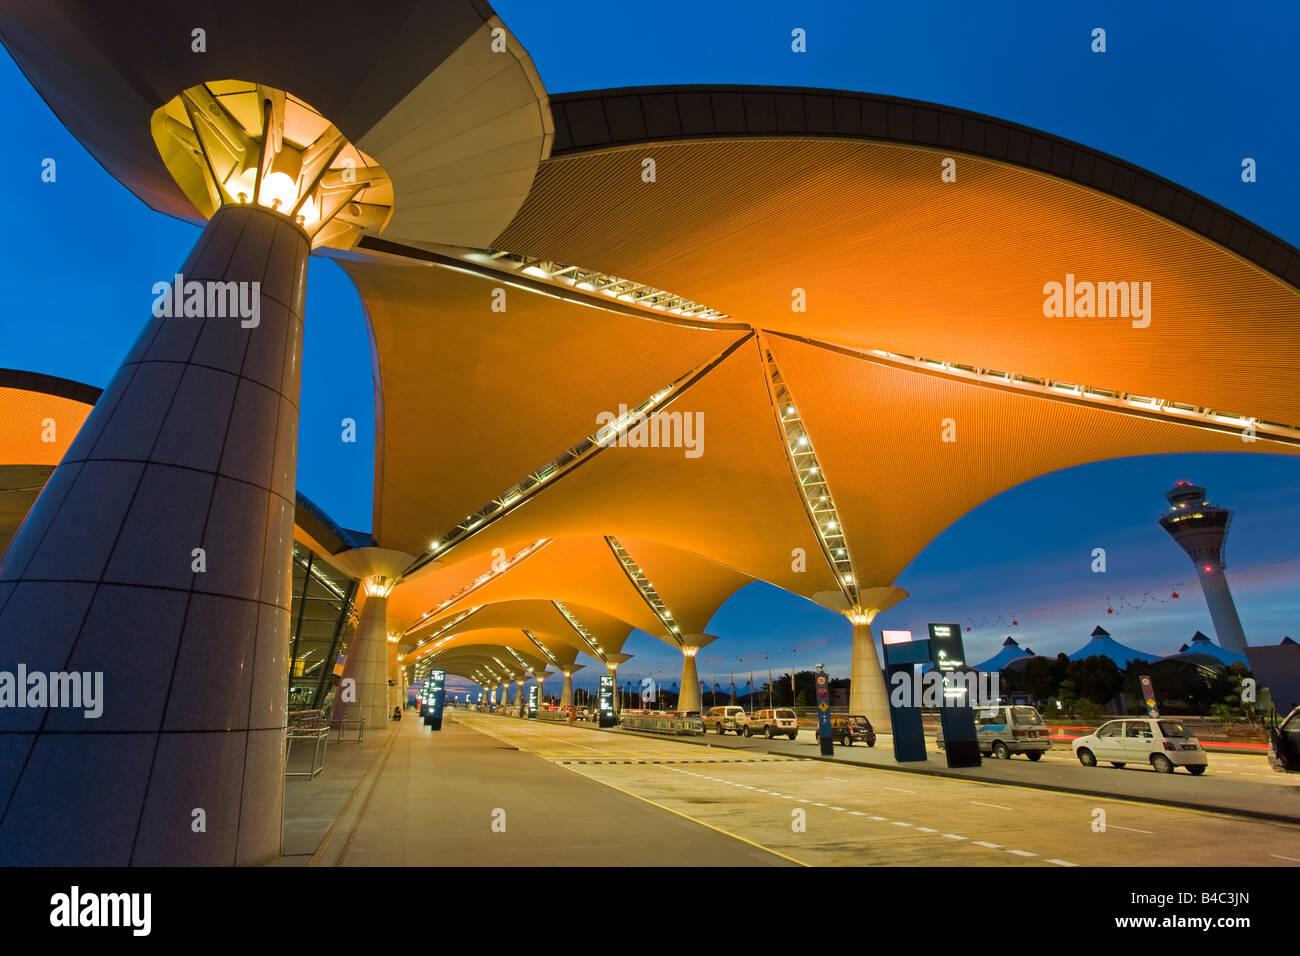 Asia, Malesia Kuala Lumpur Kuala Lumpur International Airport KLIA, moderna architettura esterna Immagini Stock